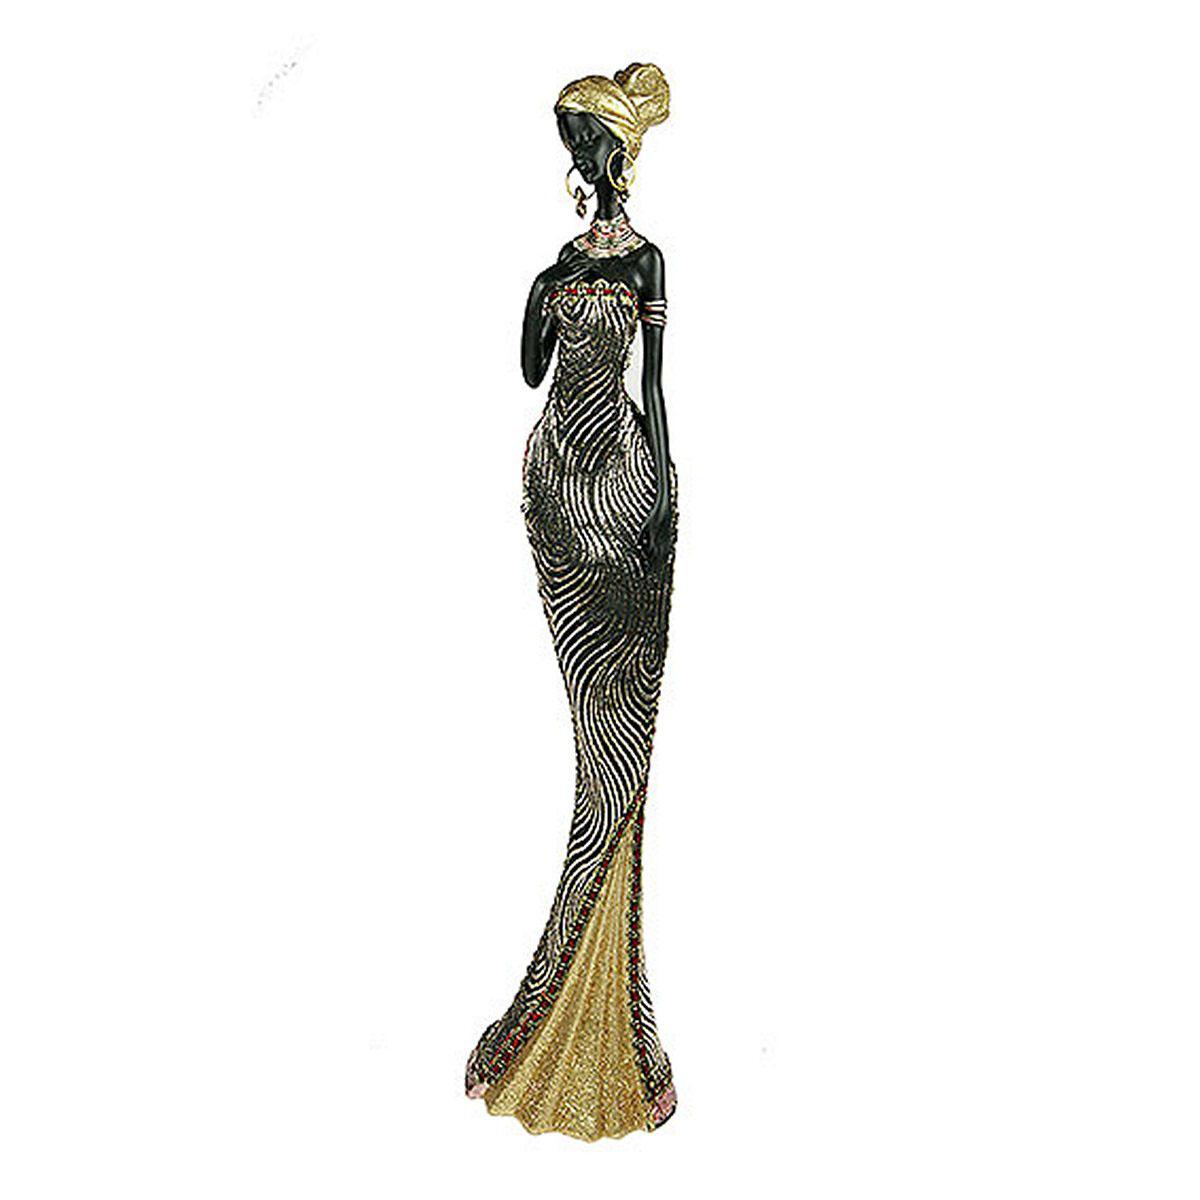 Статуэтка Русские Подарки Африканка, 10 х 12 х 43 см статуэтка lefard африканка 174 311